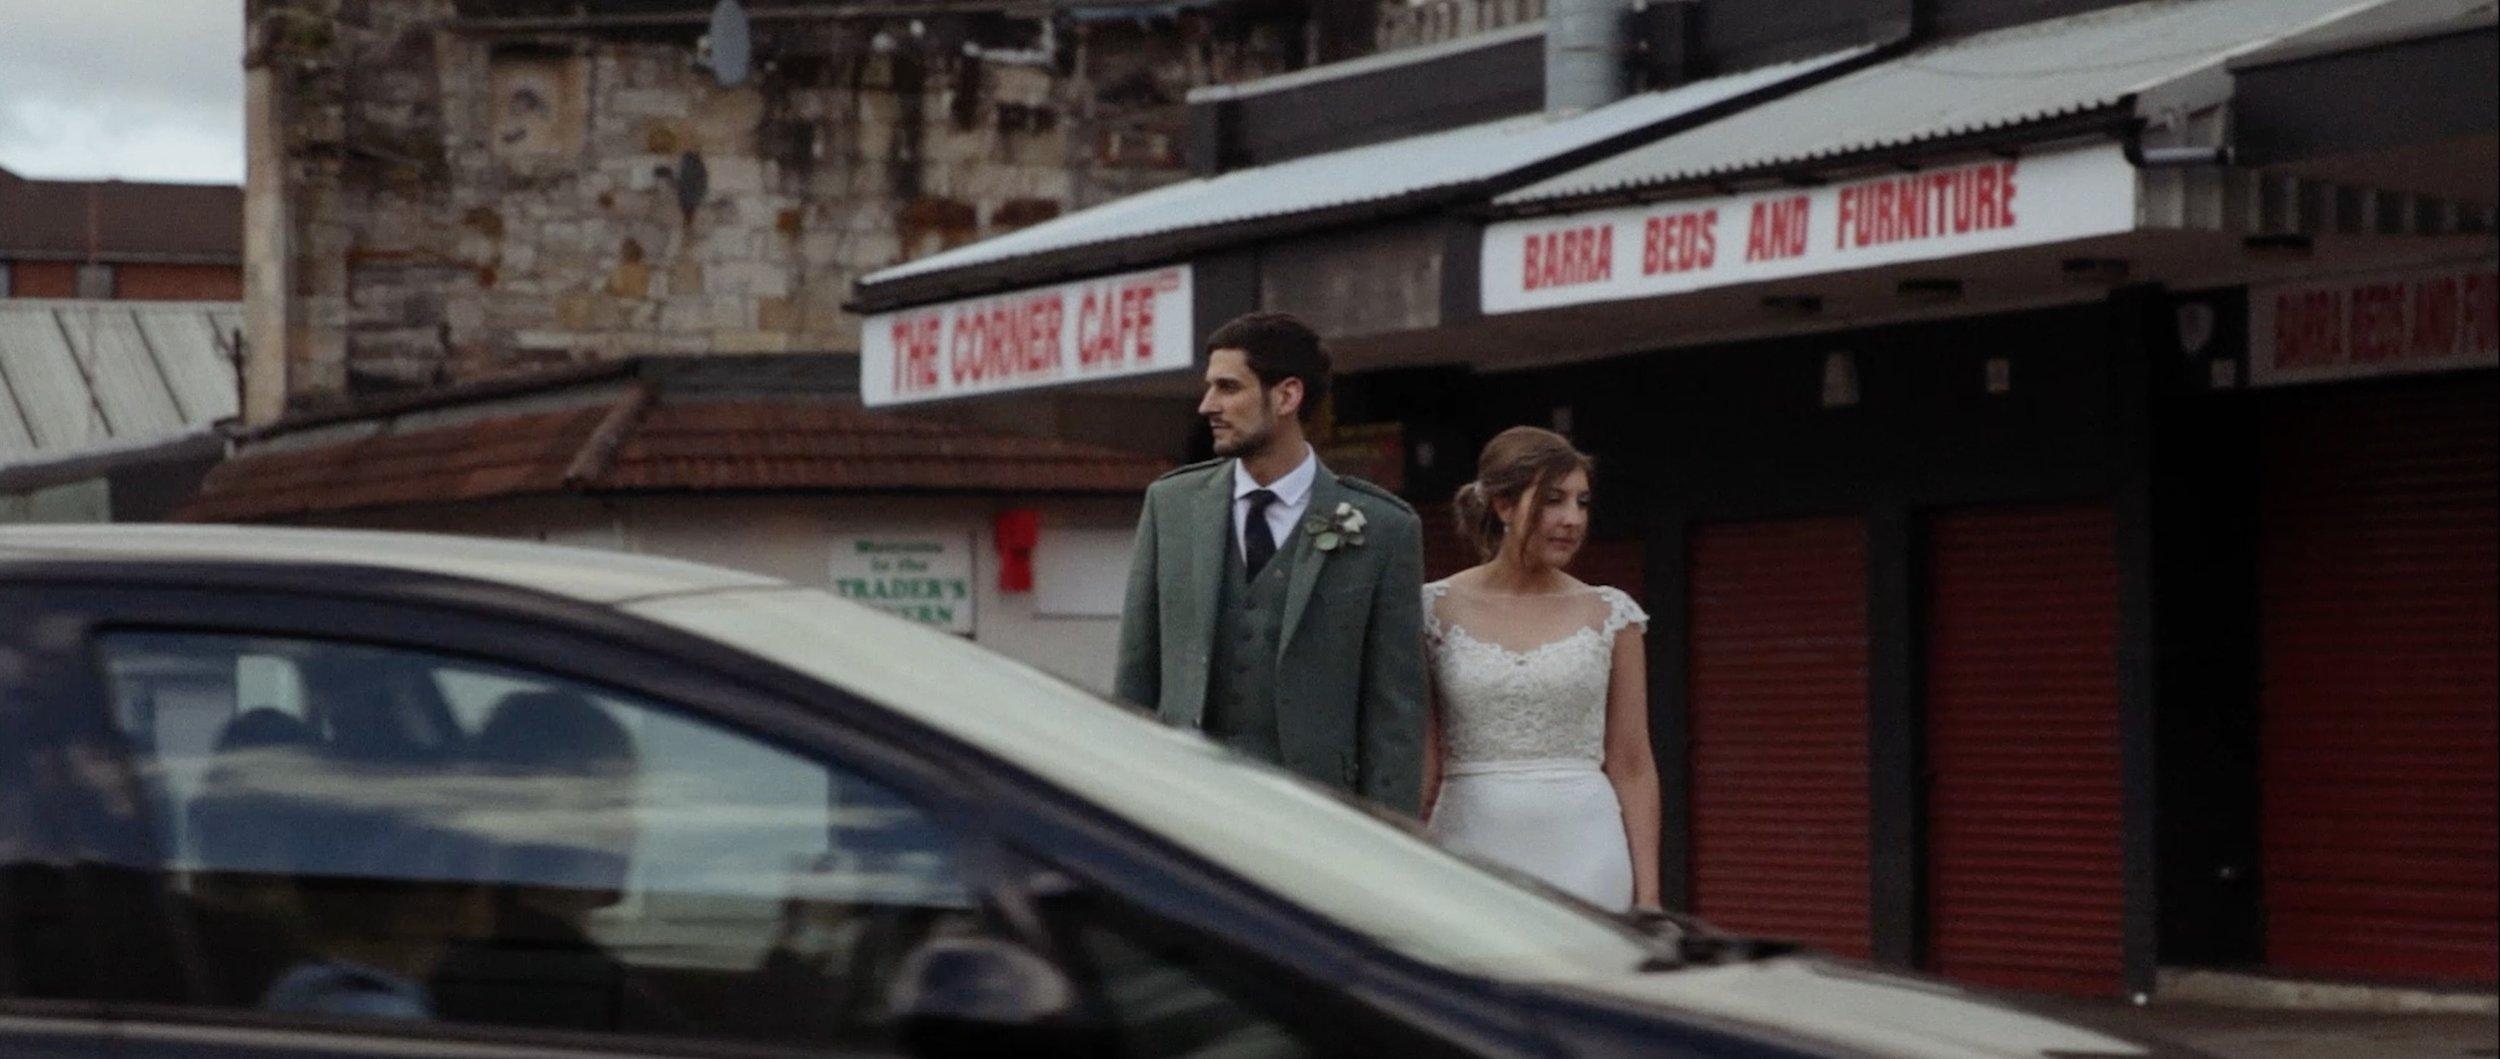 kippilaw-house-wedding-videographer_LL_05.jpg